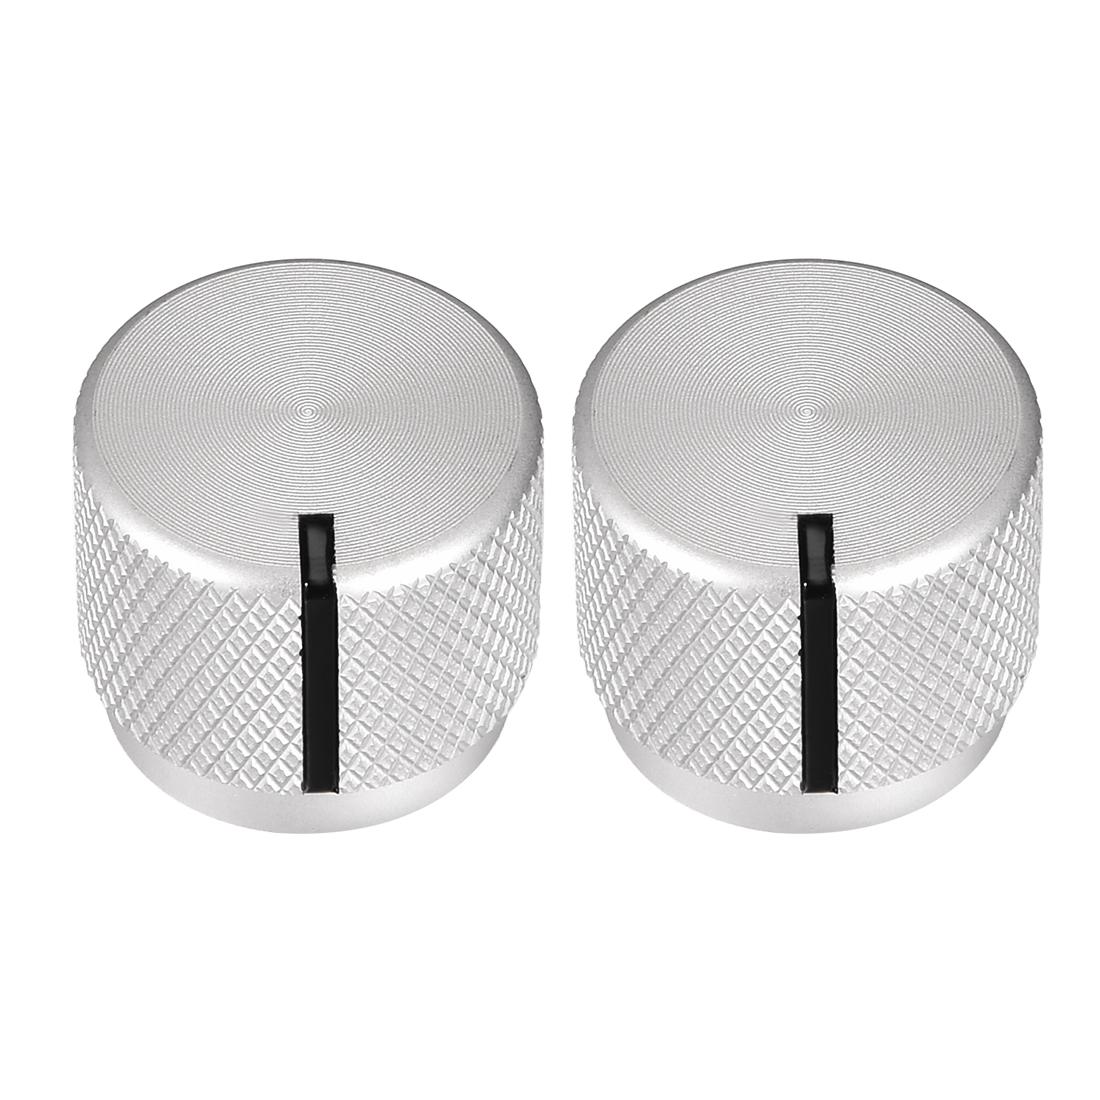 Stereo Knob, 20*6*17 mm Aluminium Alloy, Volume Control Knobs, Sliver 2pcs